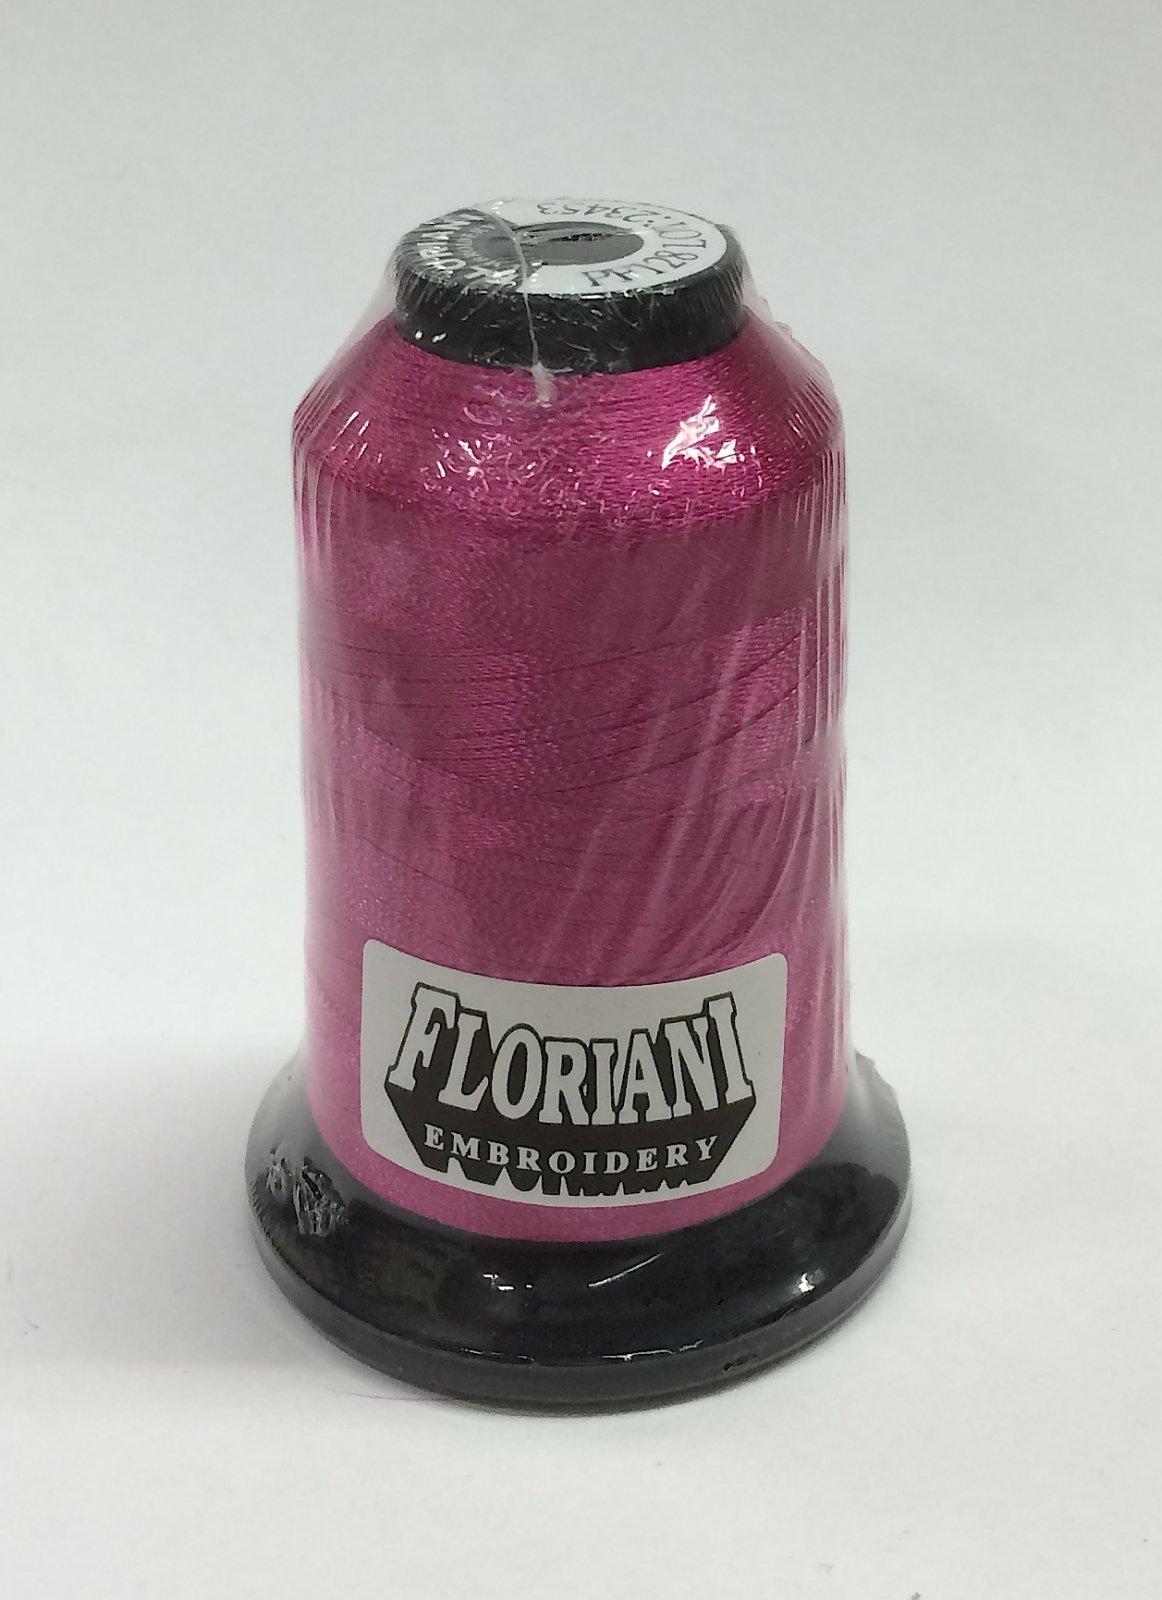 Floriani Embroidery Thread Color #0128